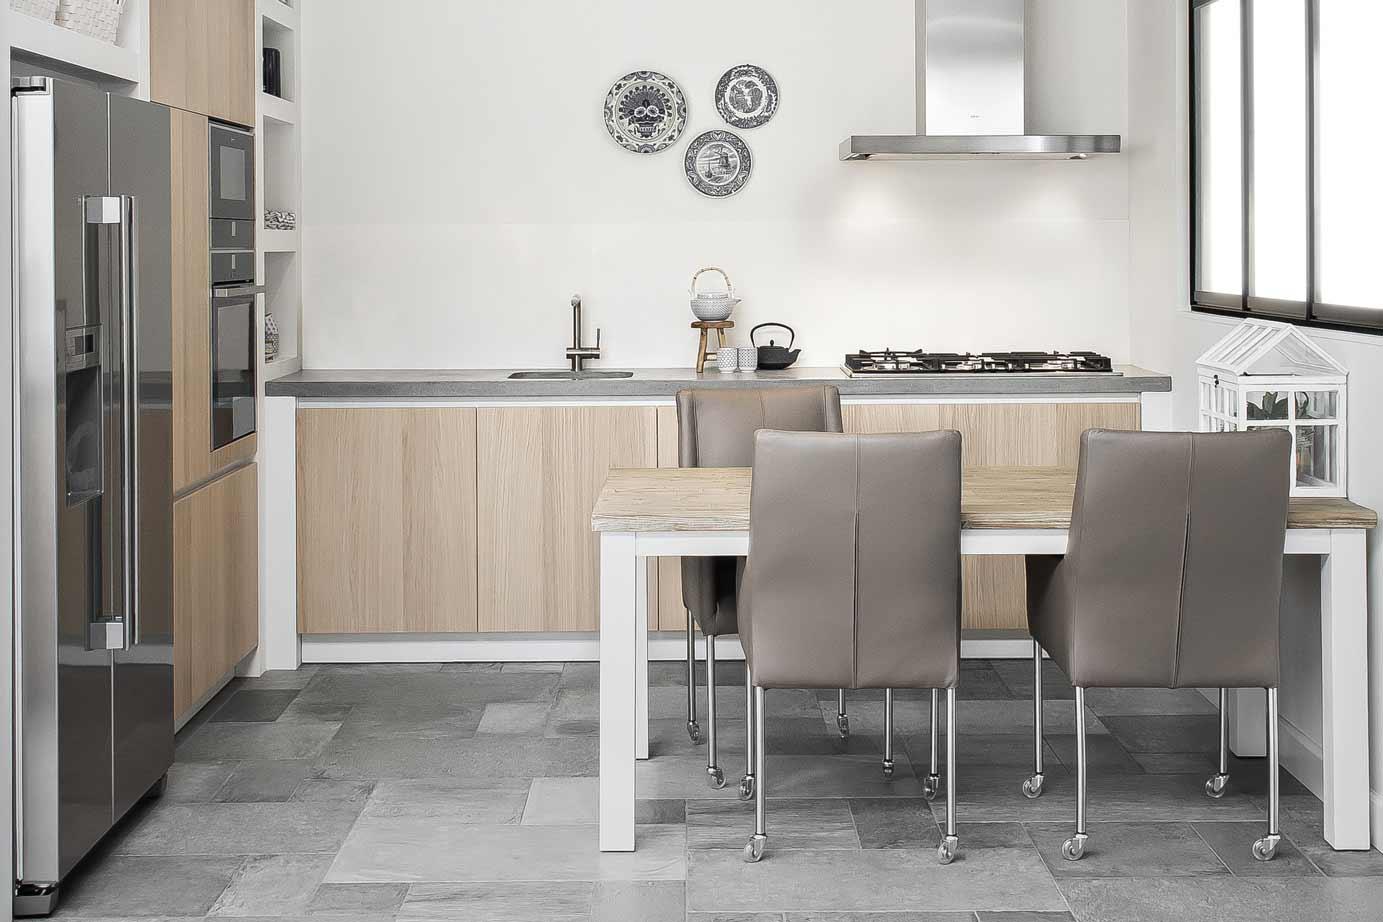 Klassieke minimale grijze en groene keuken met parketvloer moder